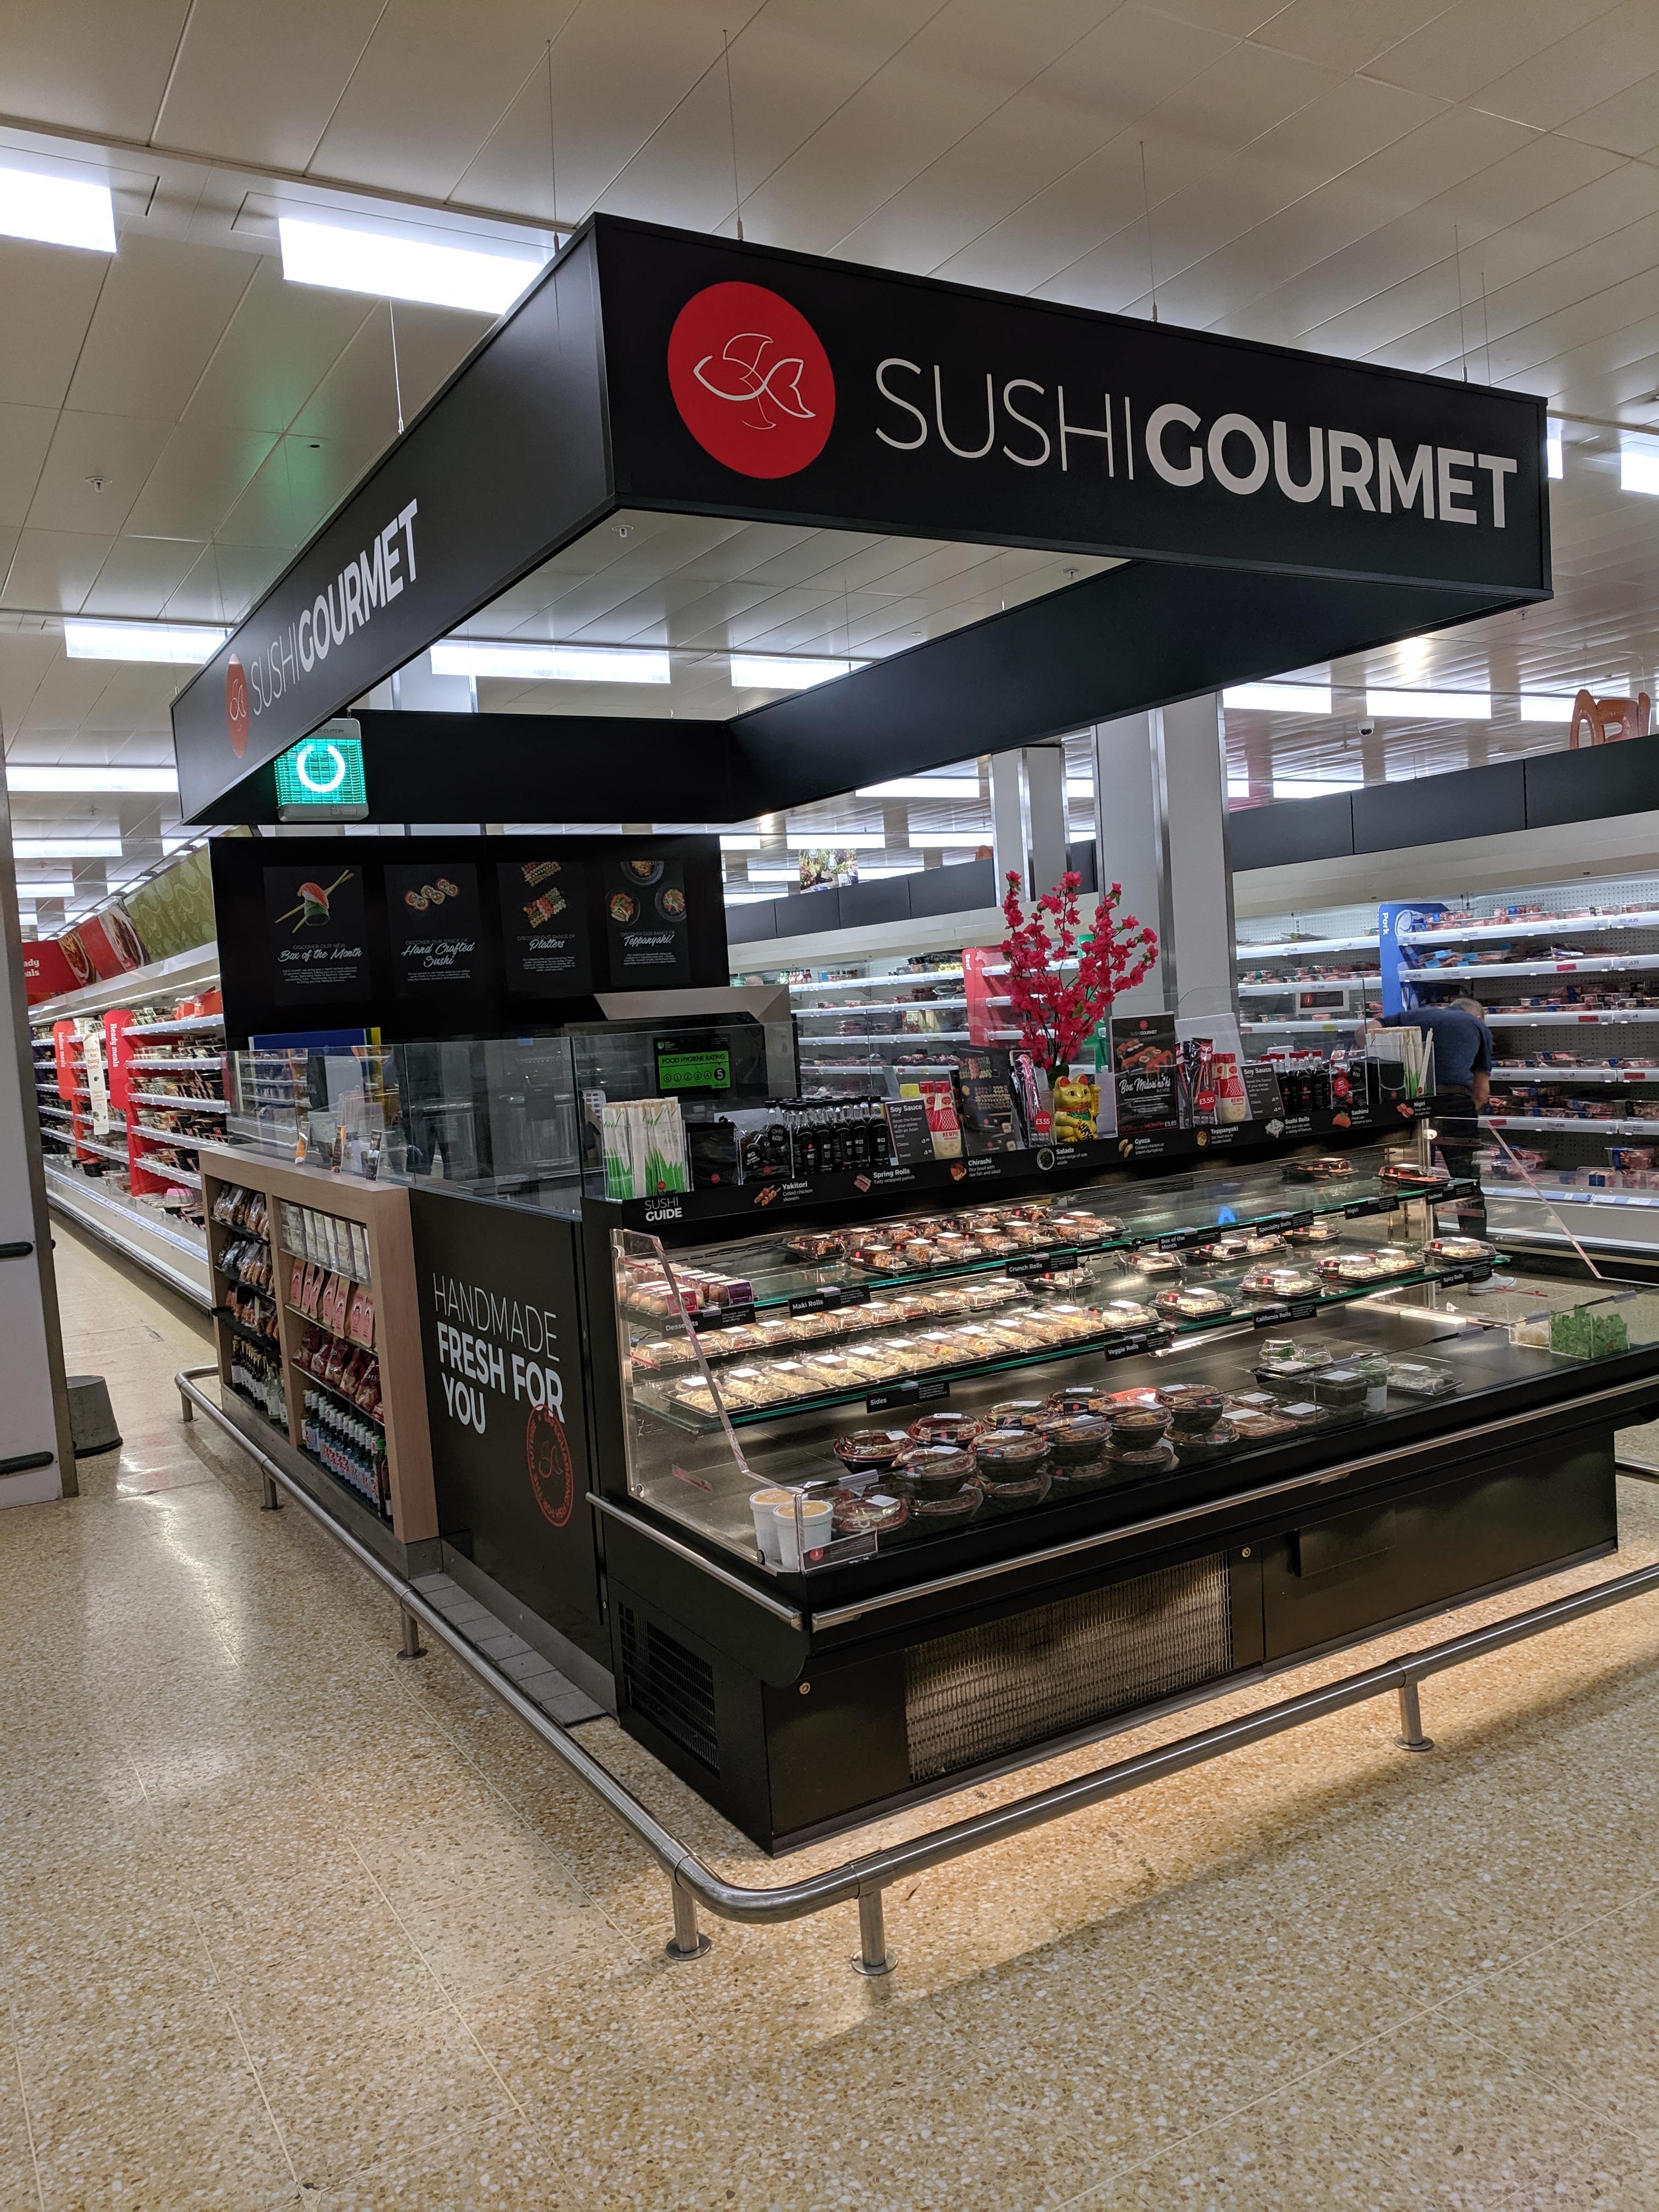 Gourmet_Sushi